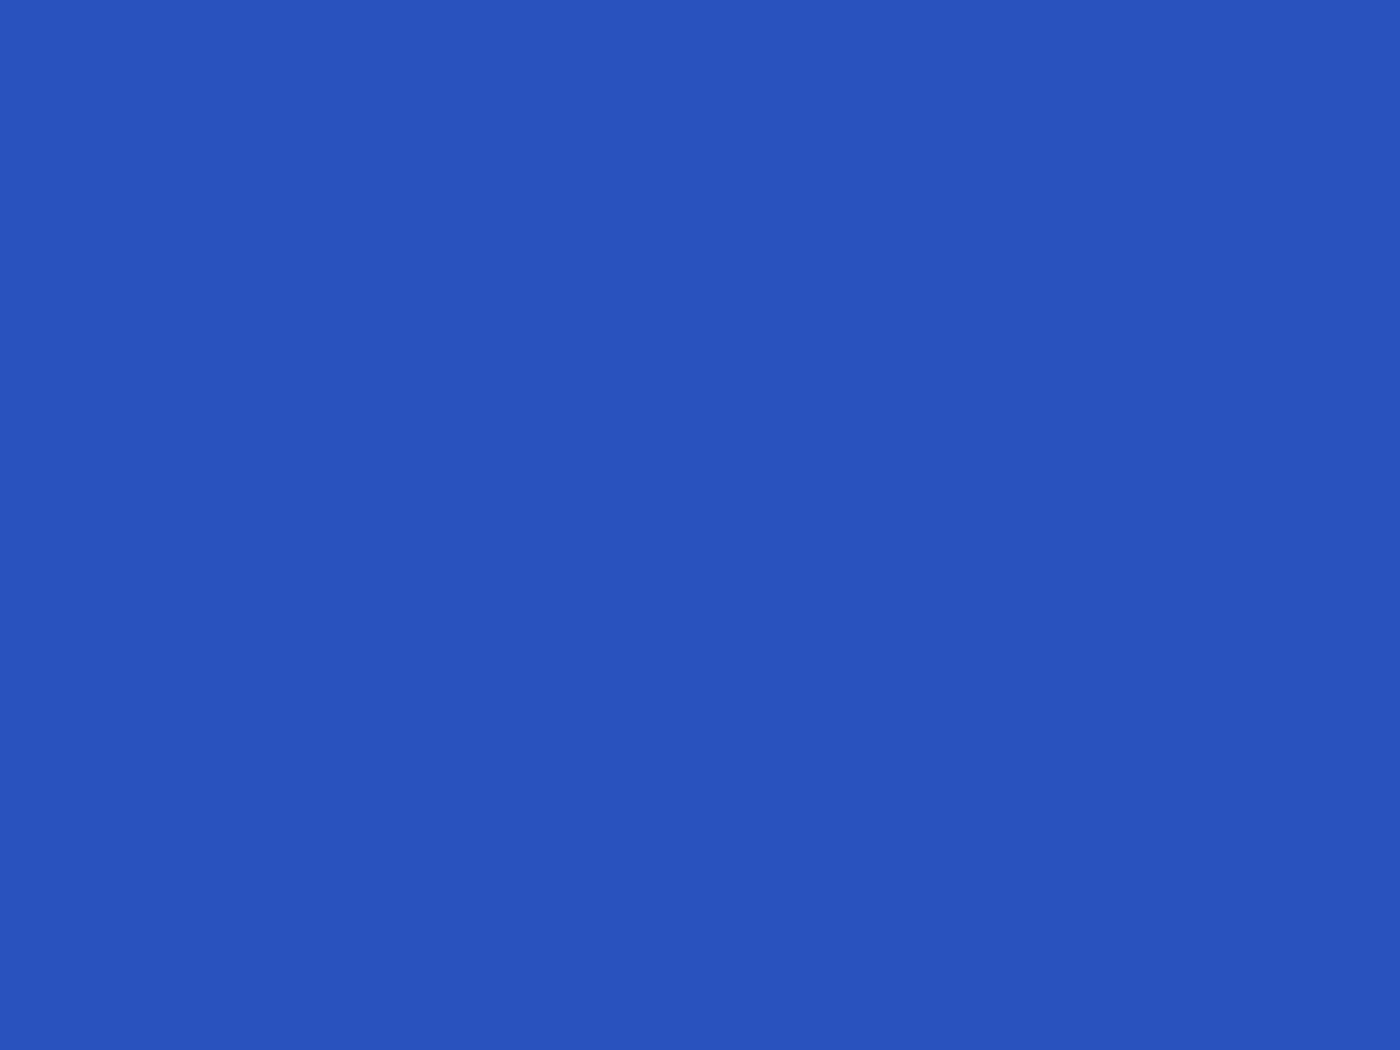 1400x1050 Cerulean Blue Solid Color Background